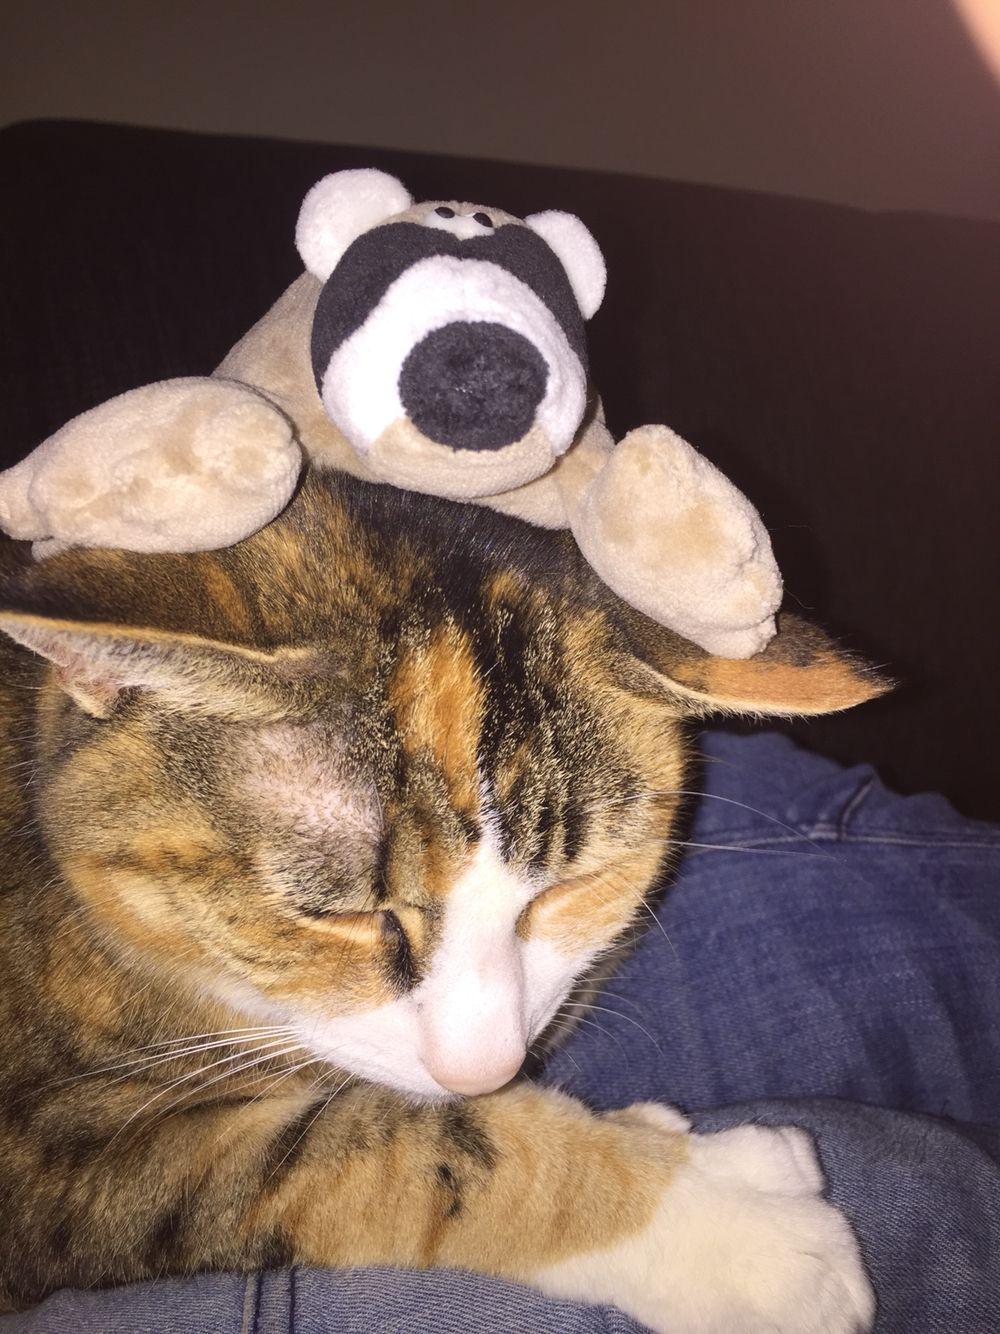 My Cat being cute